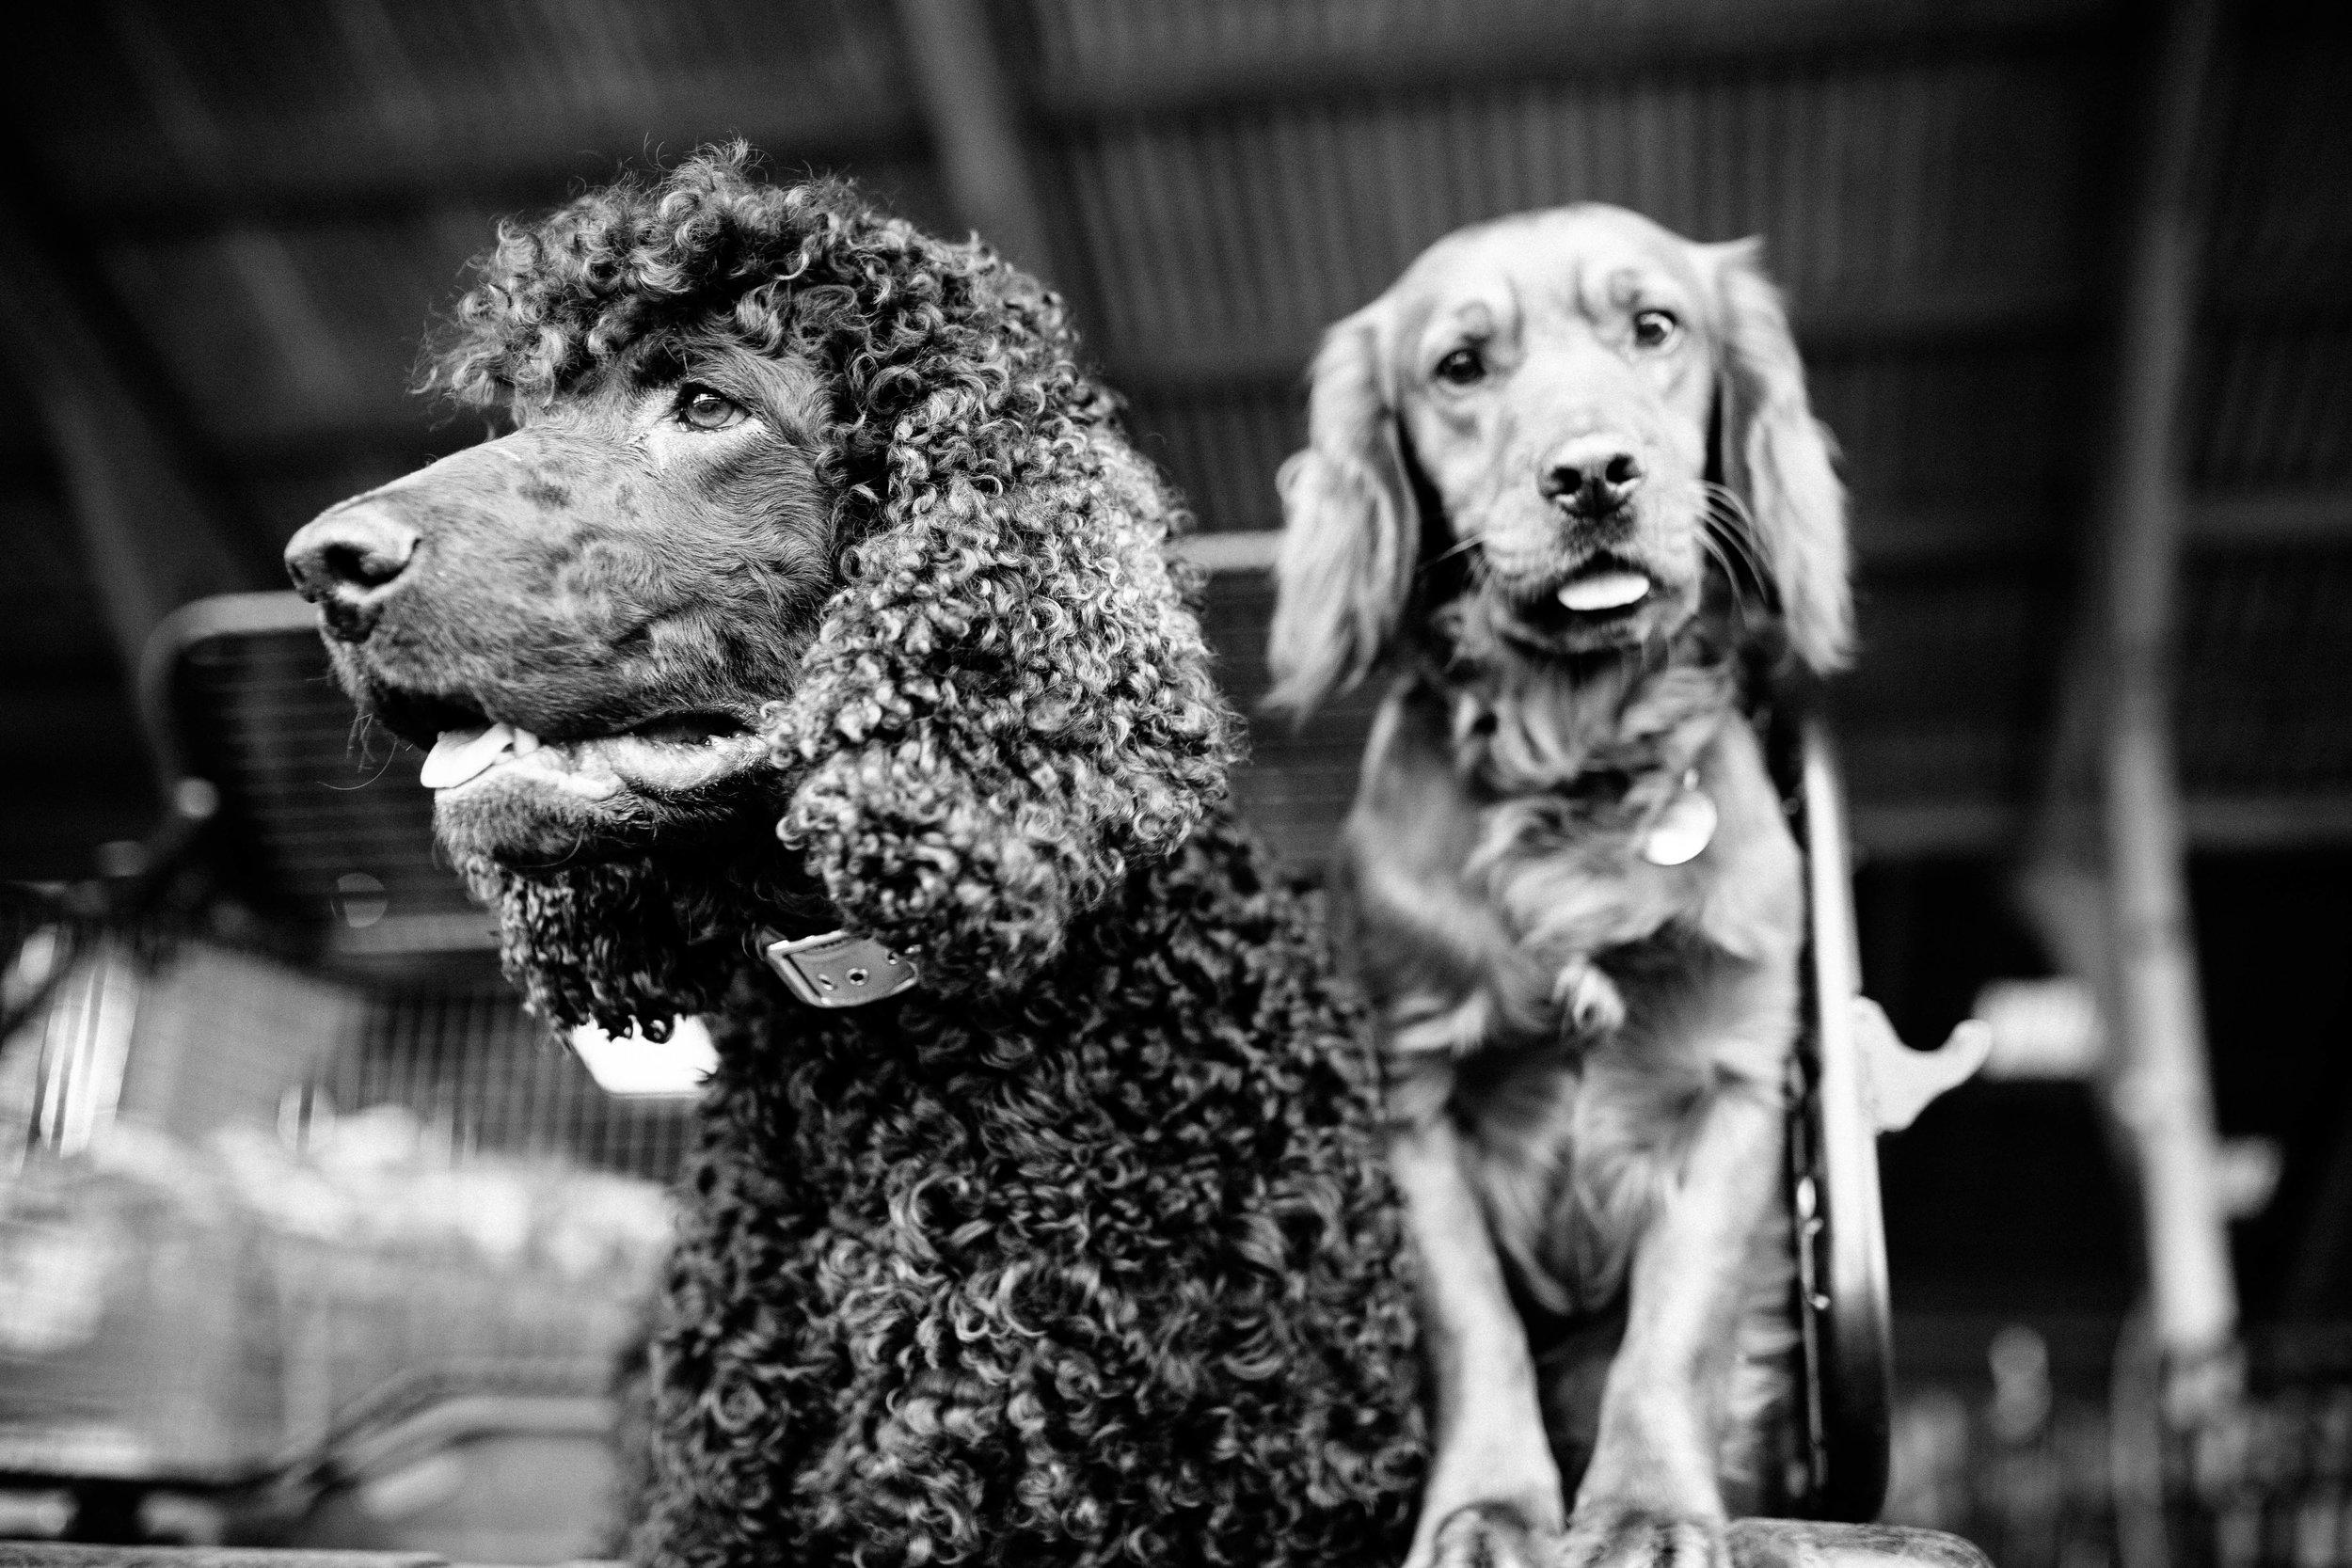 HORSE FARM FAMILY DOG PHOTOSHOOT 00007.JPG